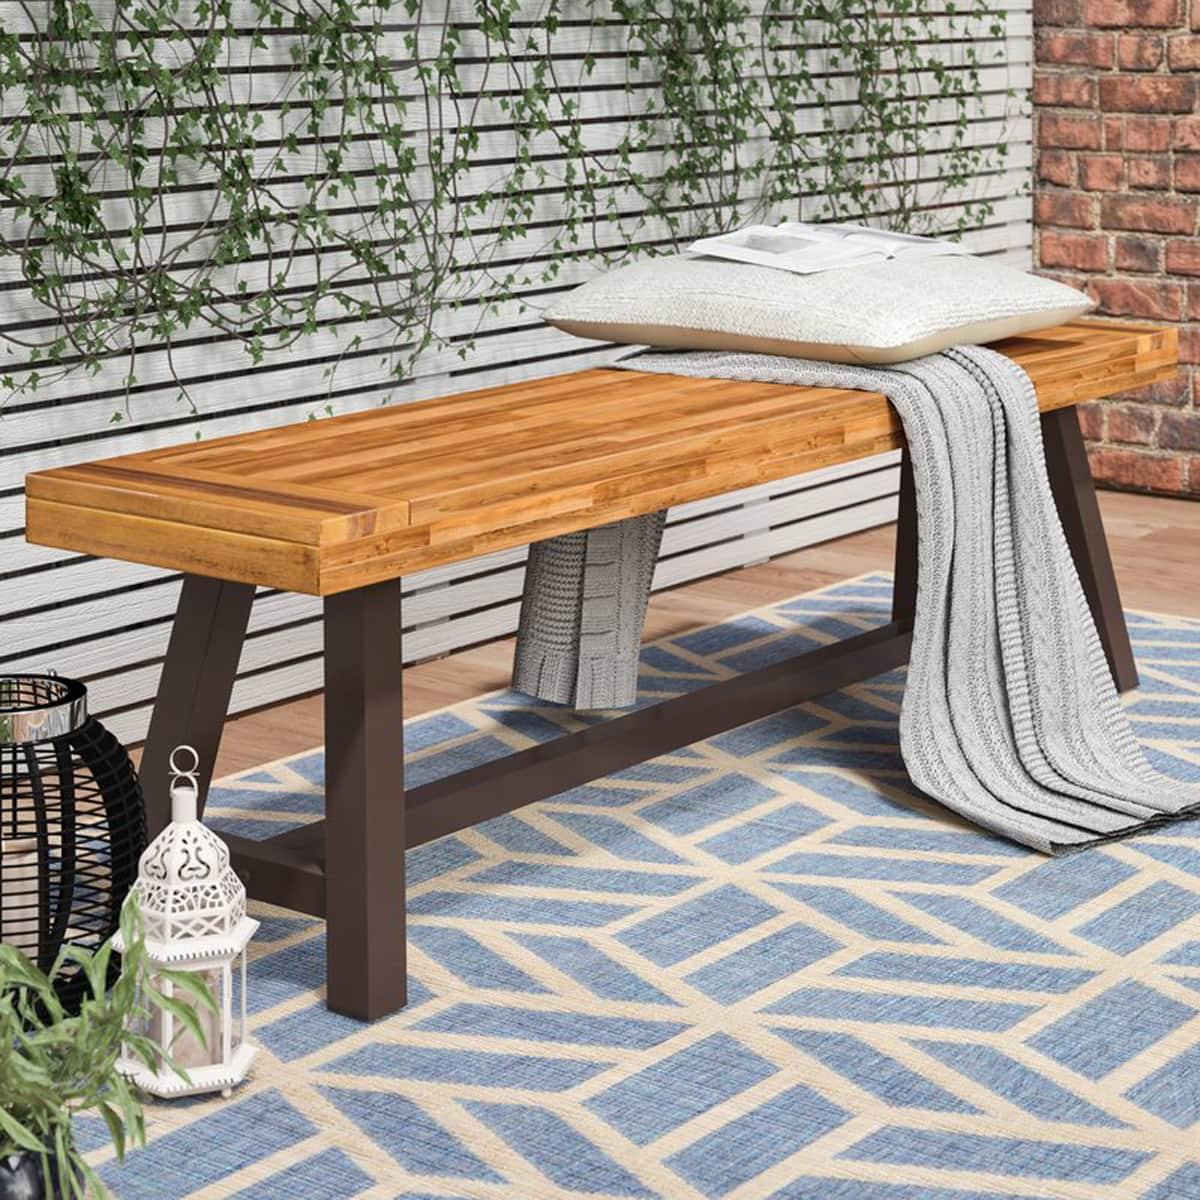 Wayfair Sale - Best Outdoor Furniture, Rug, Storage